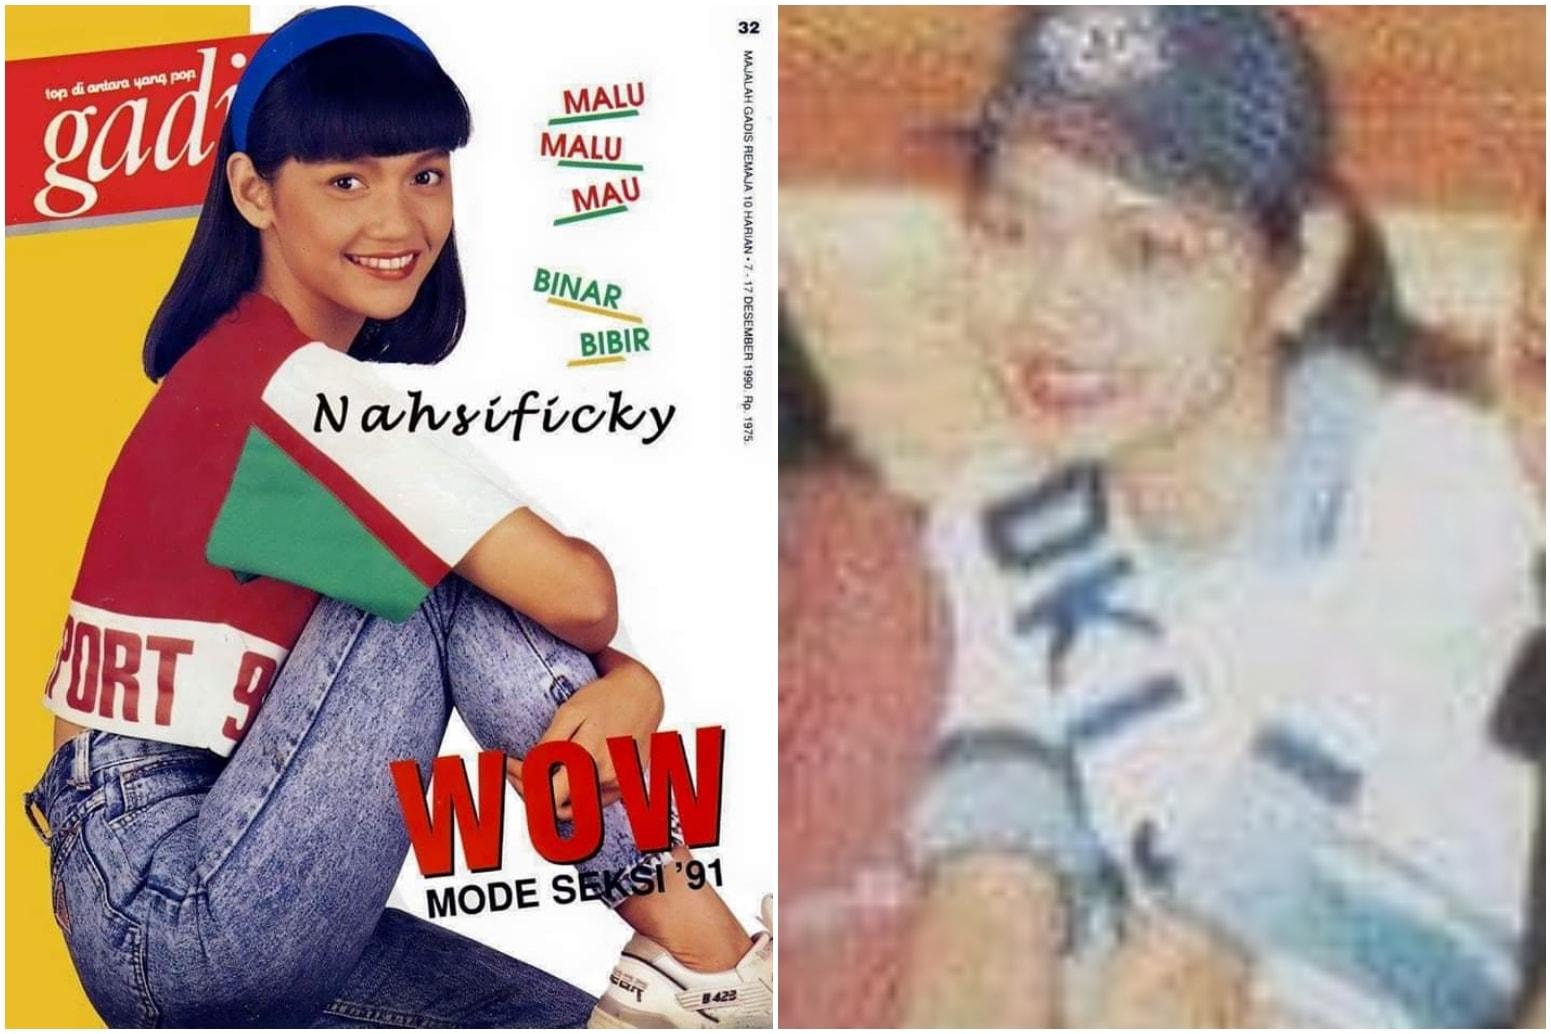 Sheila-Mutia-Gadis-Sampul-1990-Puteri-Indonesia-DKI-Jakarta-5-1996